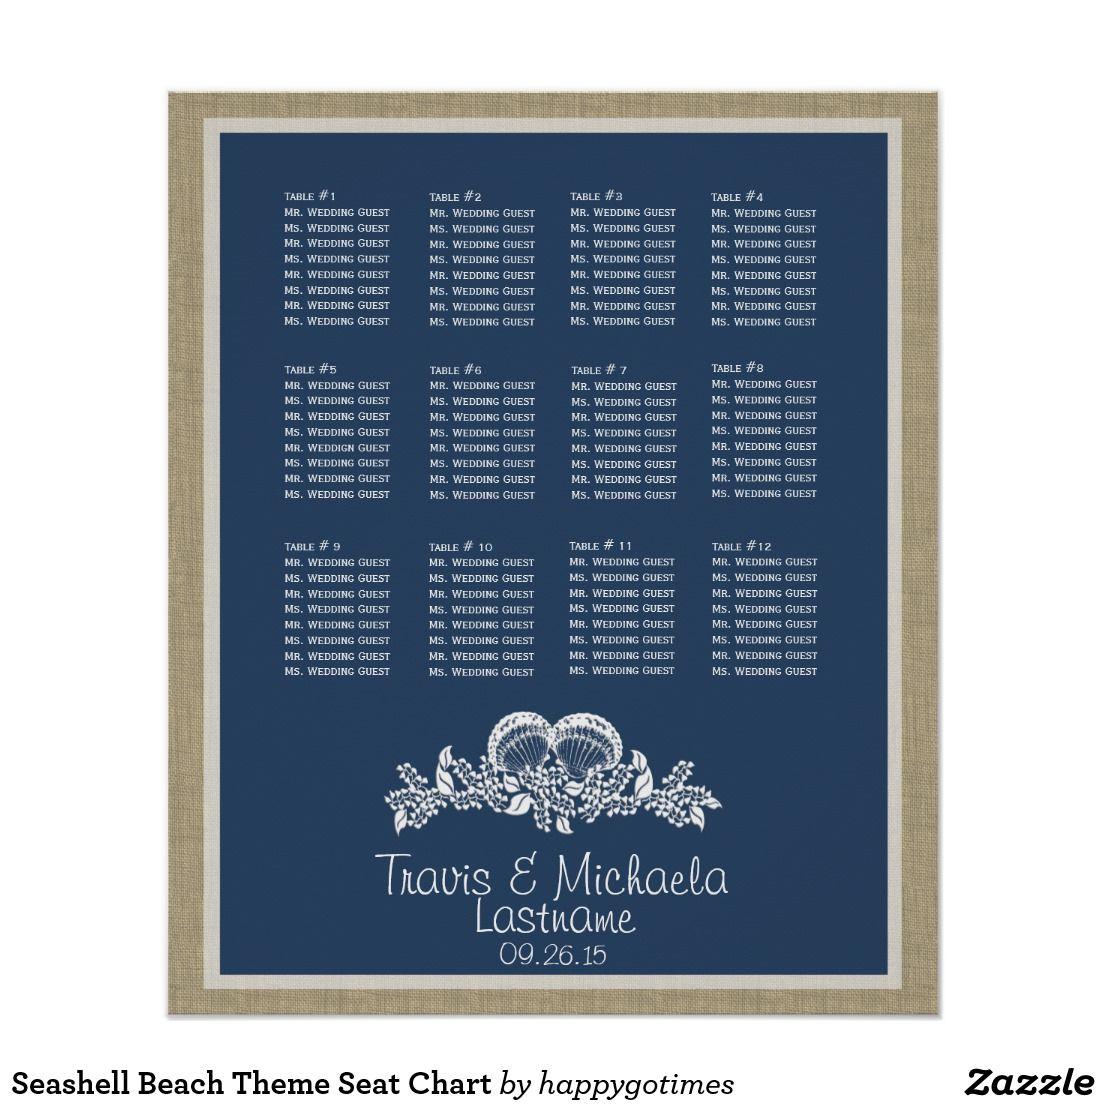 Seashell Beach Theme Seat Chart Seating